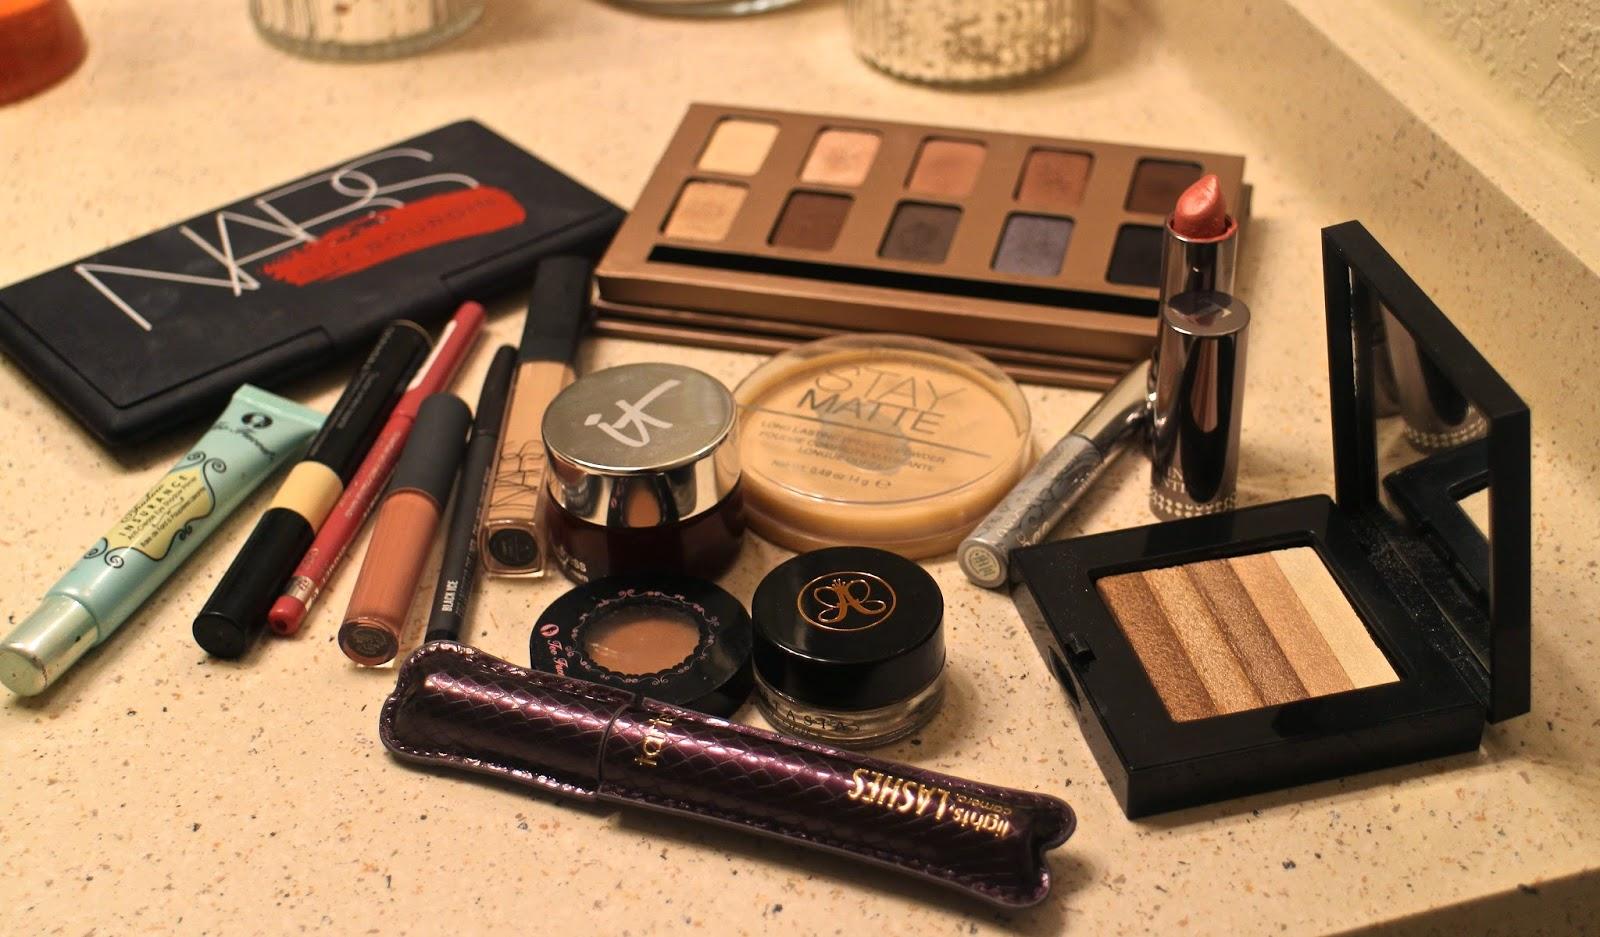 NYE makeup look